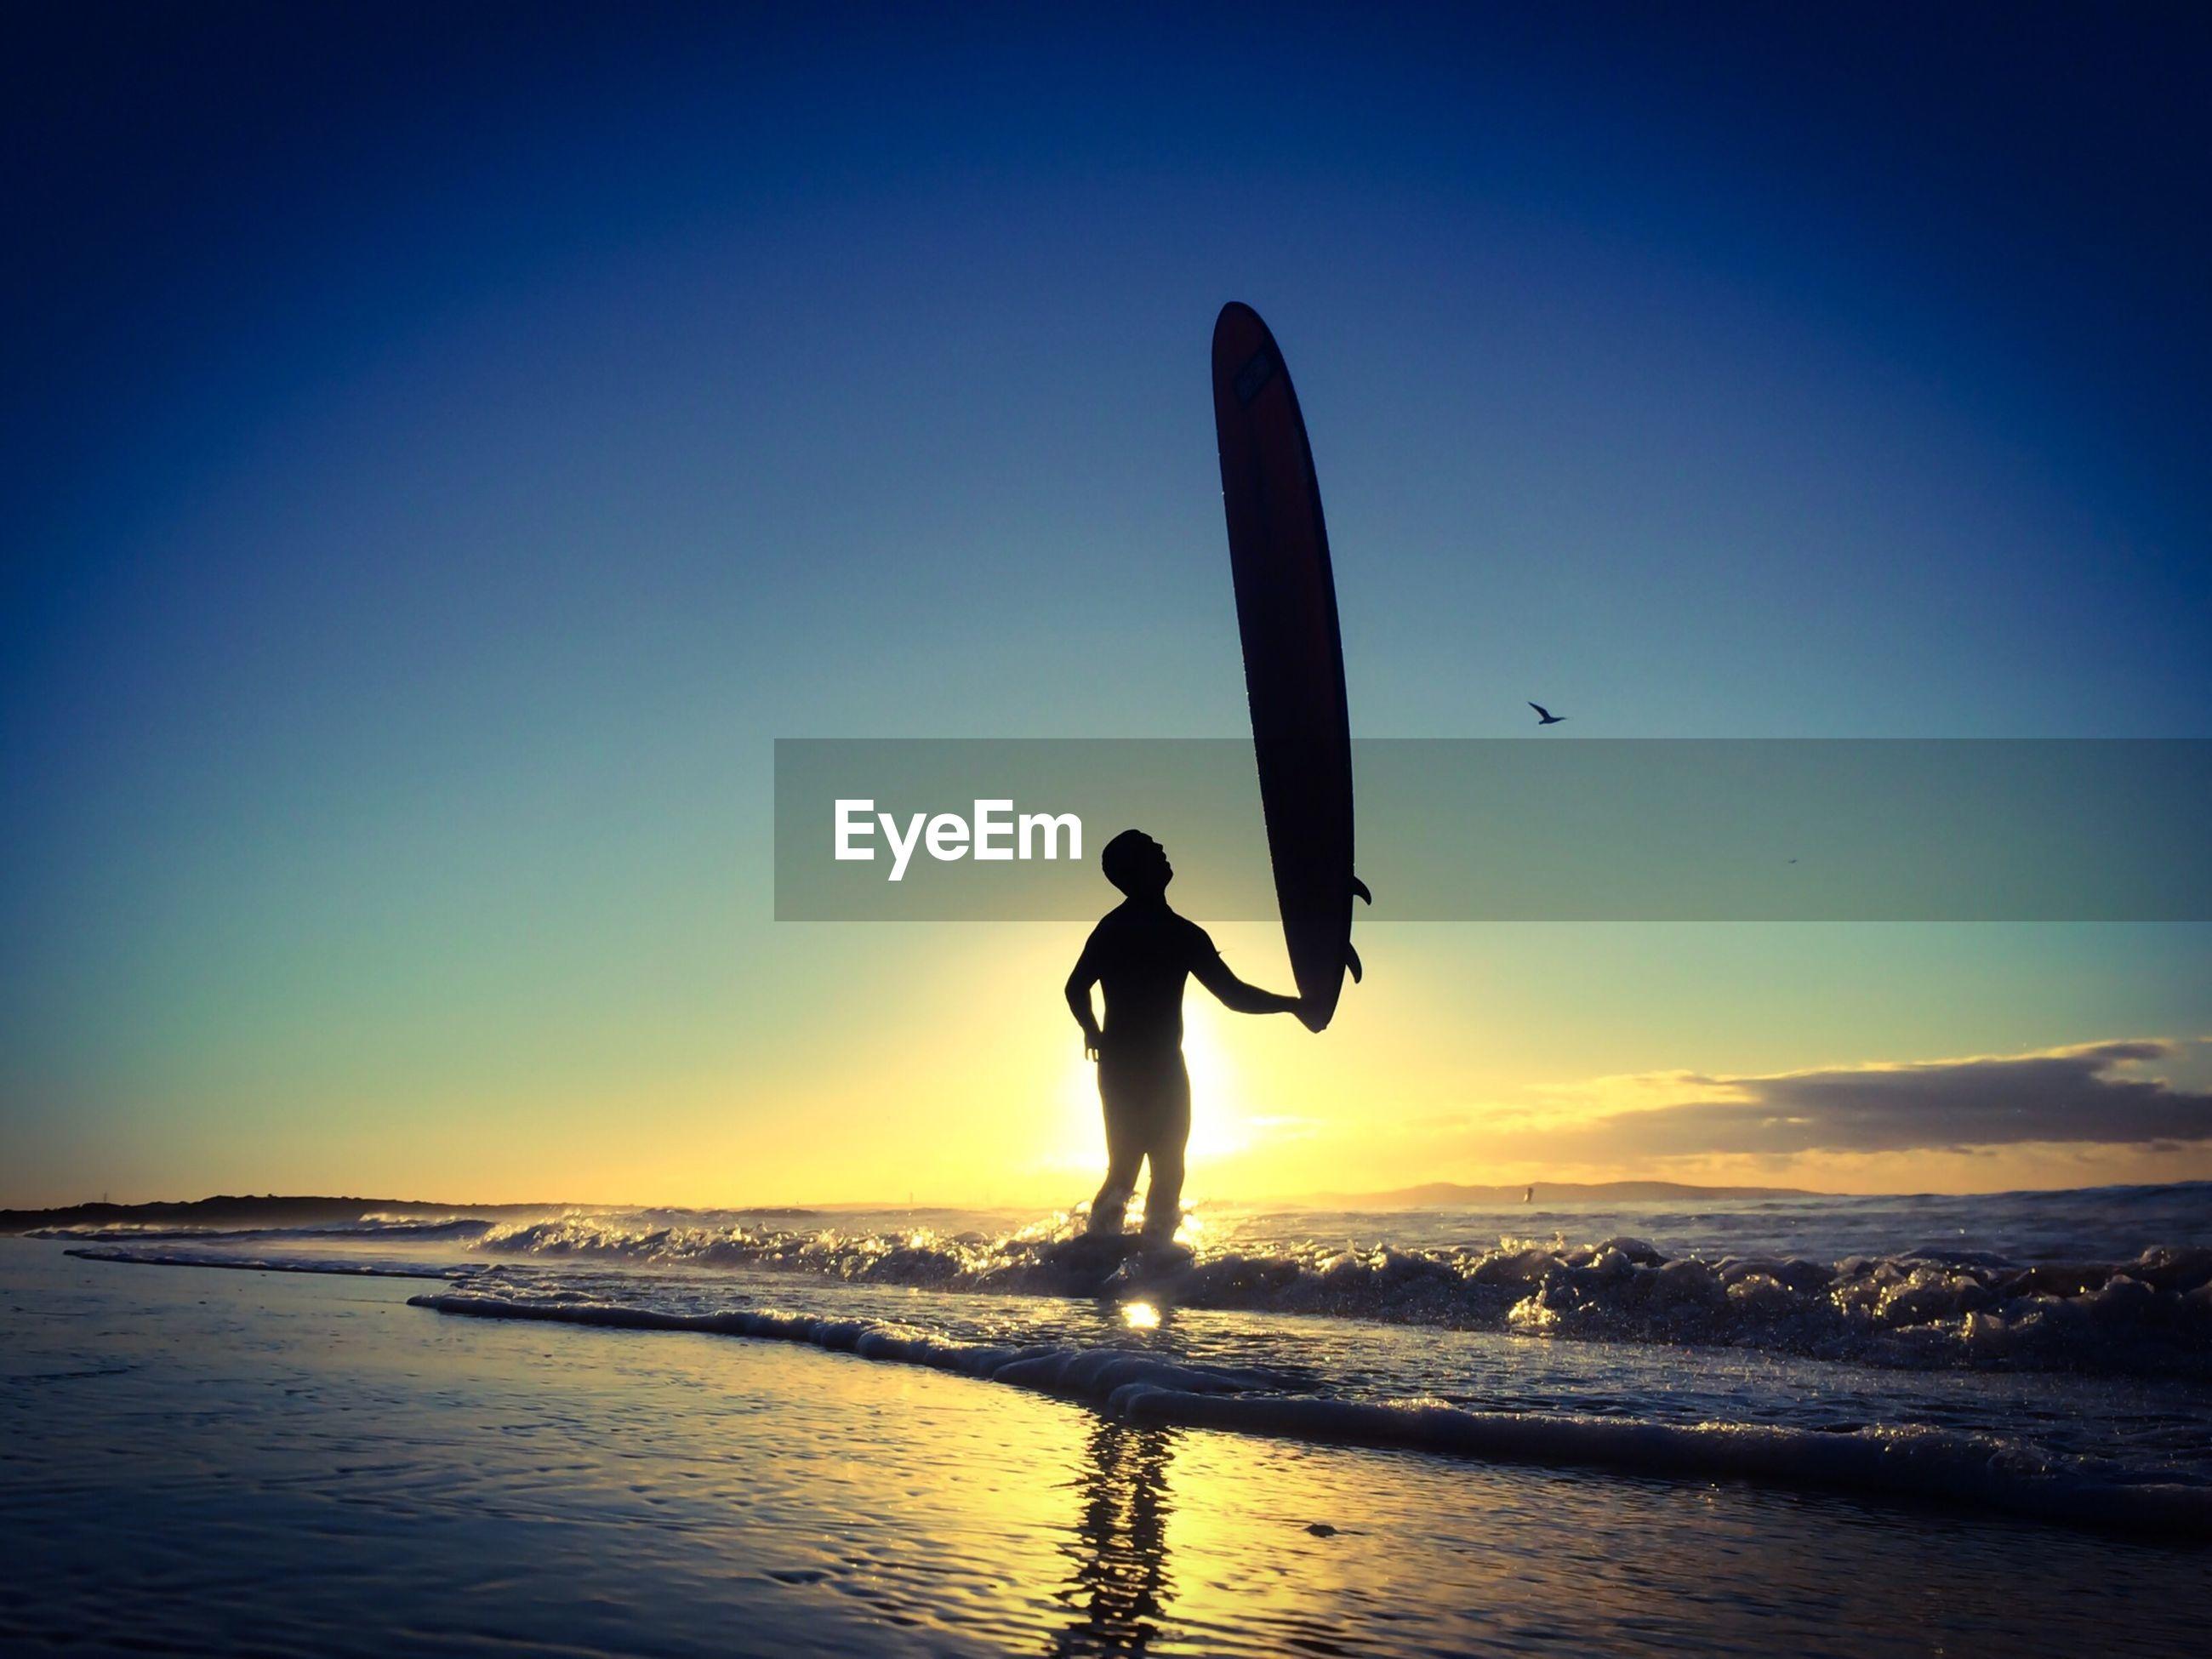 Silhouette man with surfboard on beach against clear blue sky